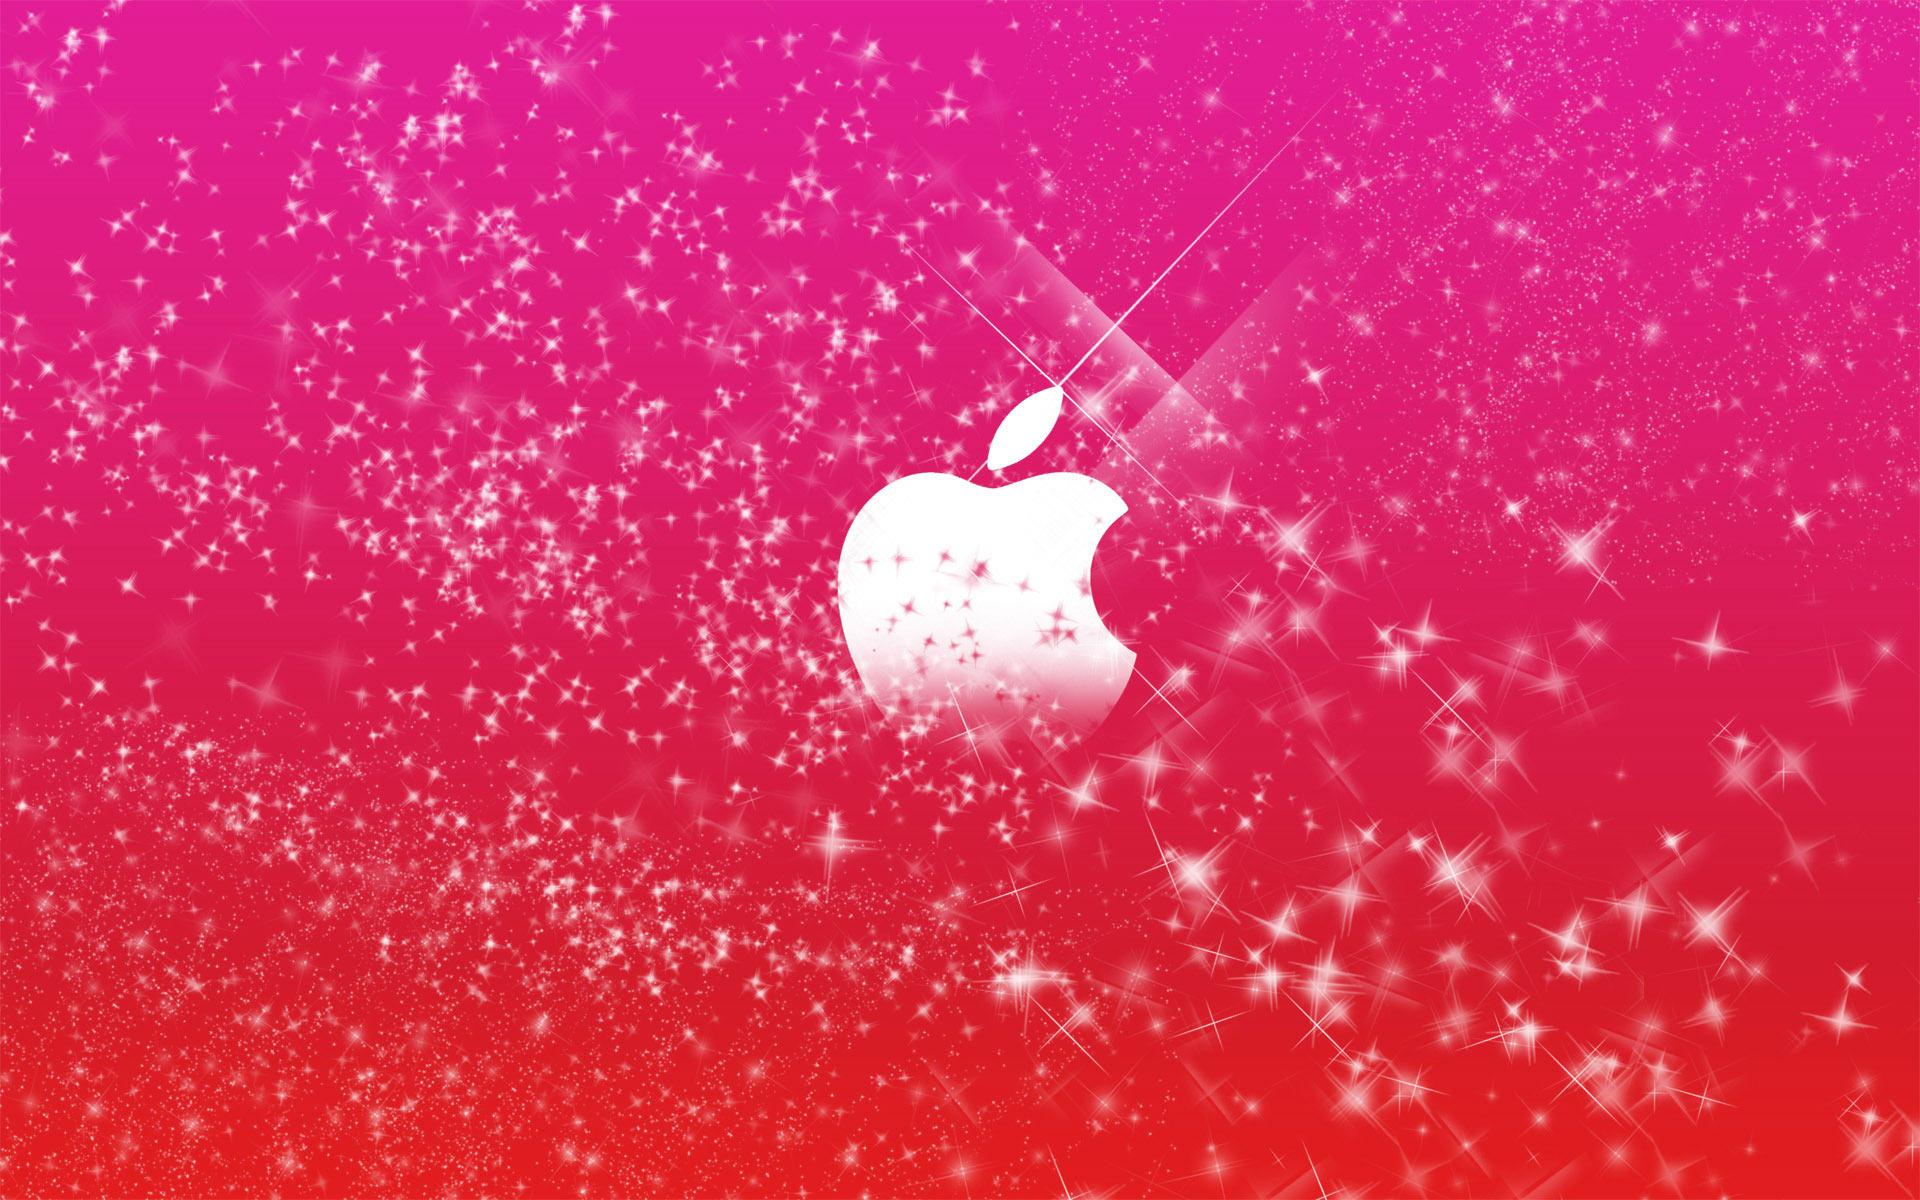 cool desktop backgrounds for mac cool desktop backgrounds for 1920x1200